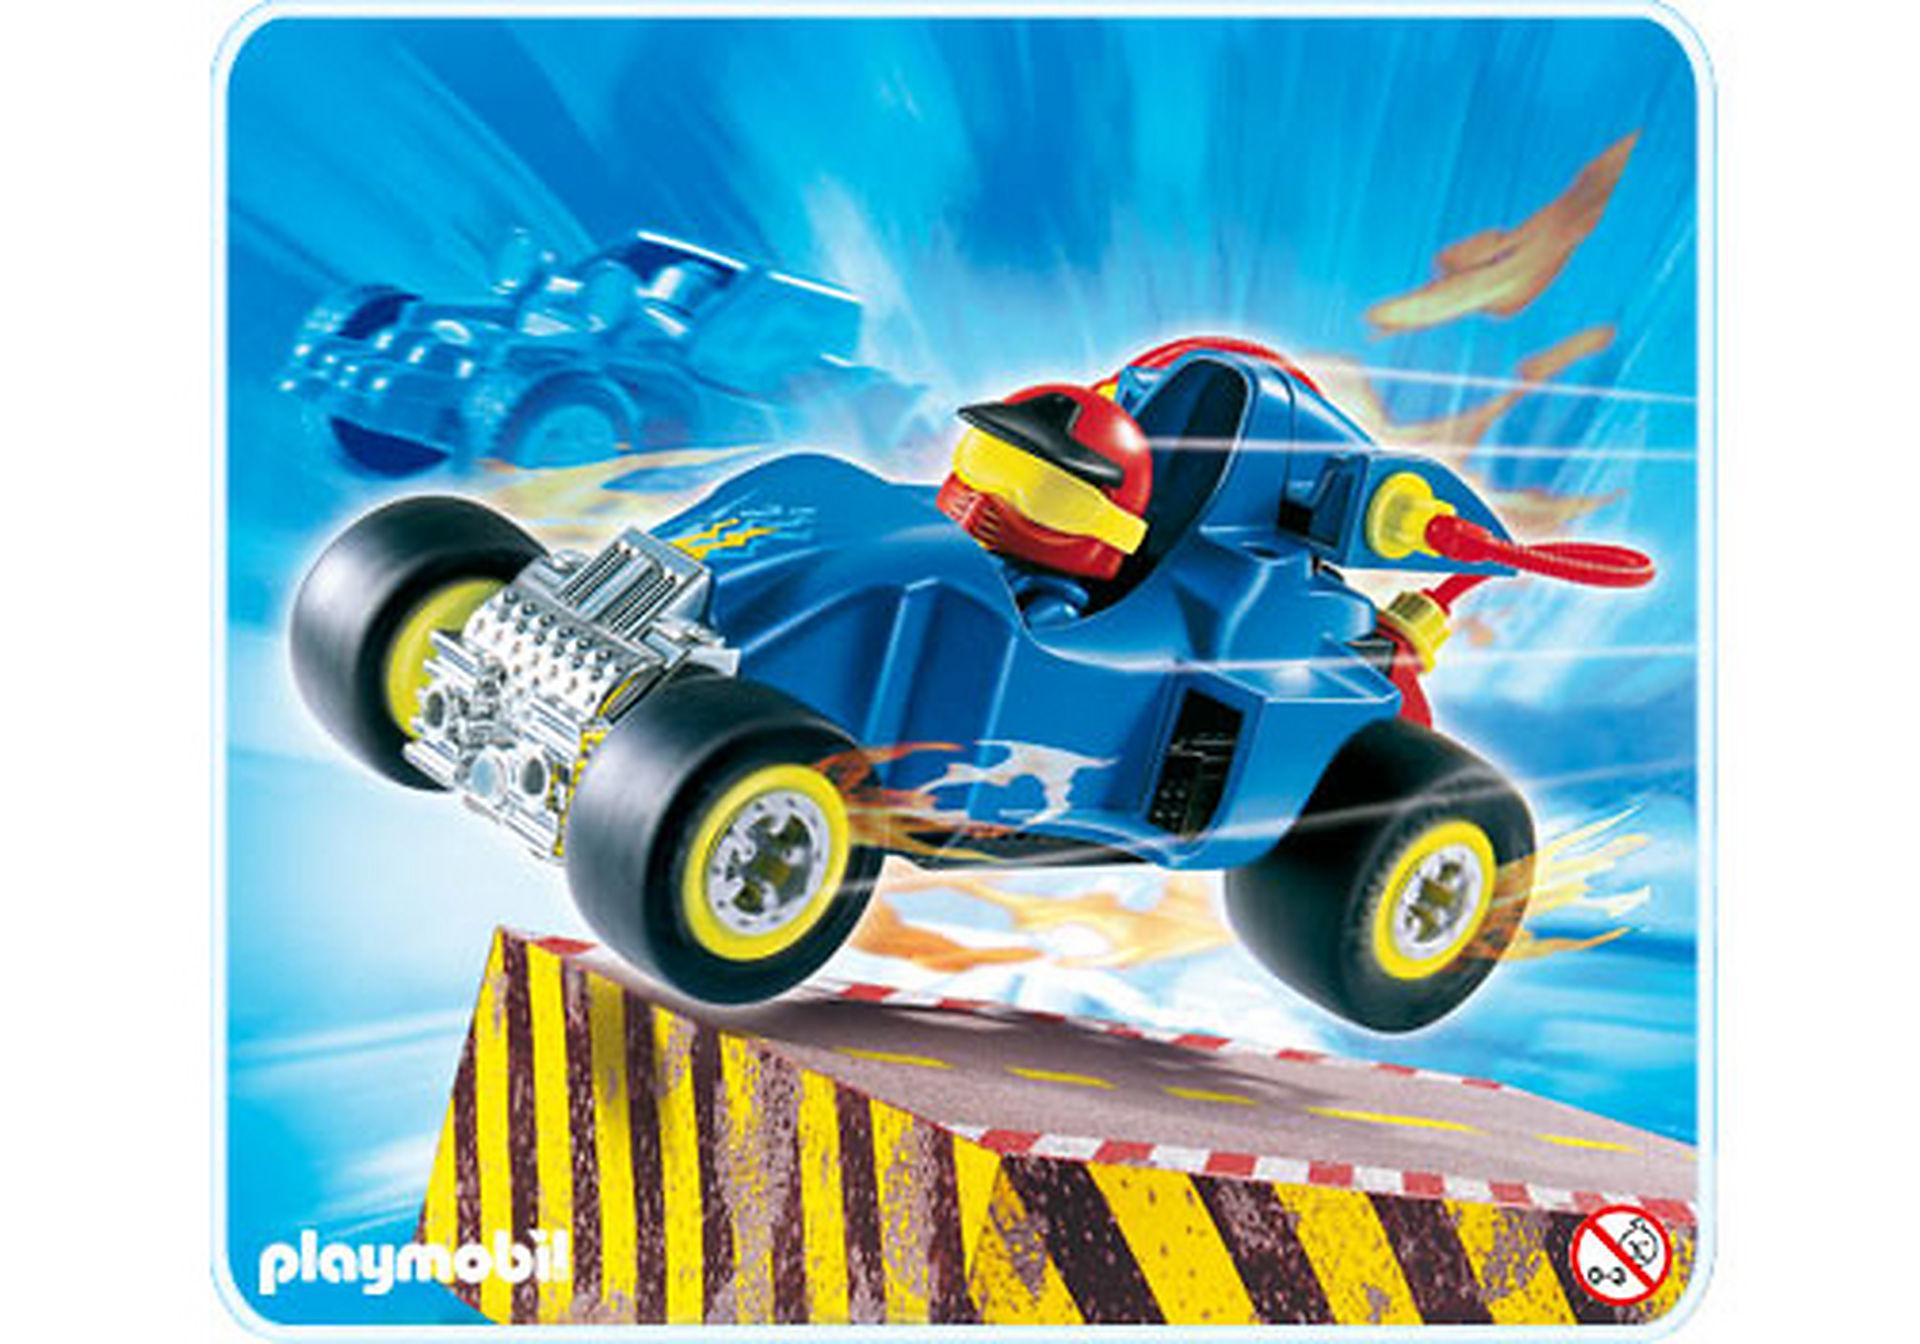 4181-A Pilote avec voiture transformable bleue zoom image1